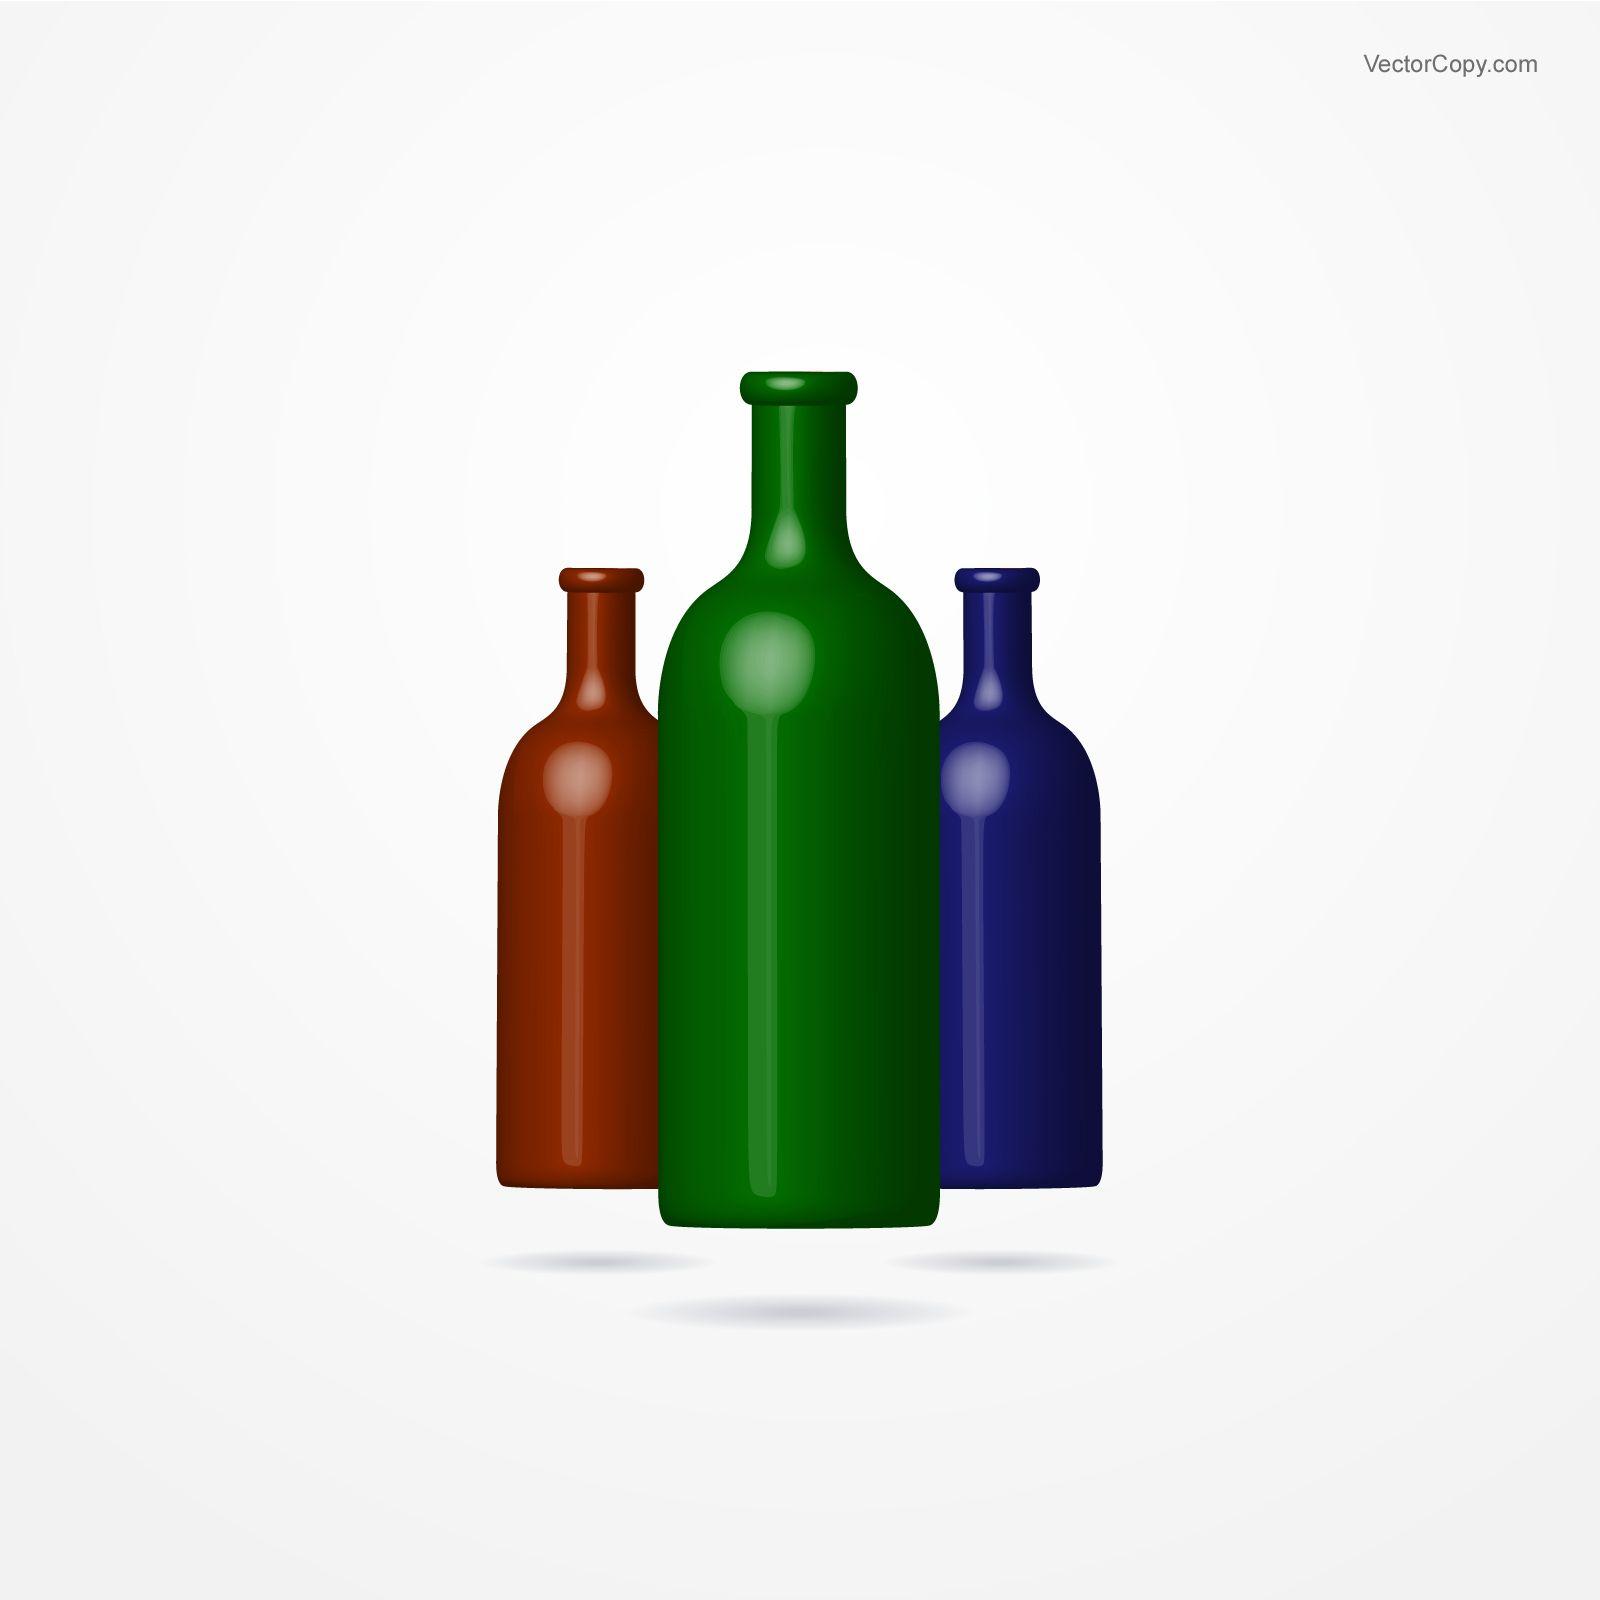 Bottles, free vector